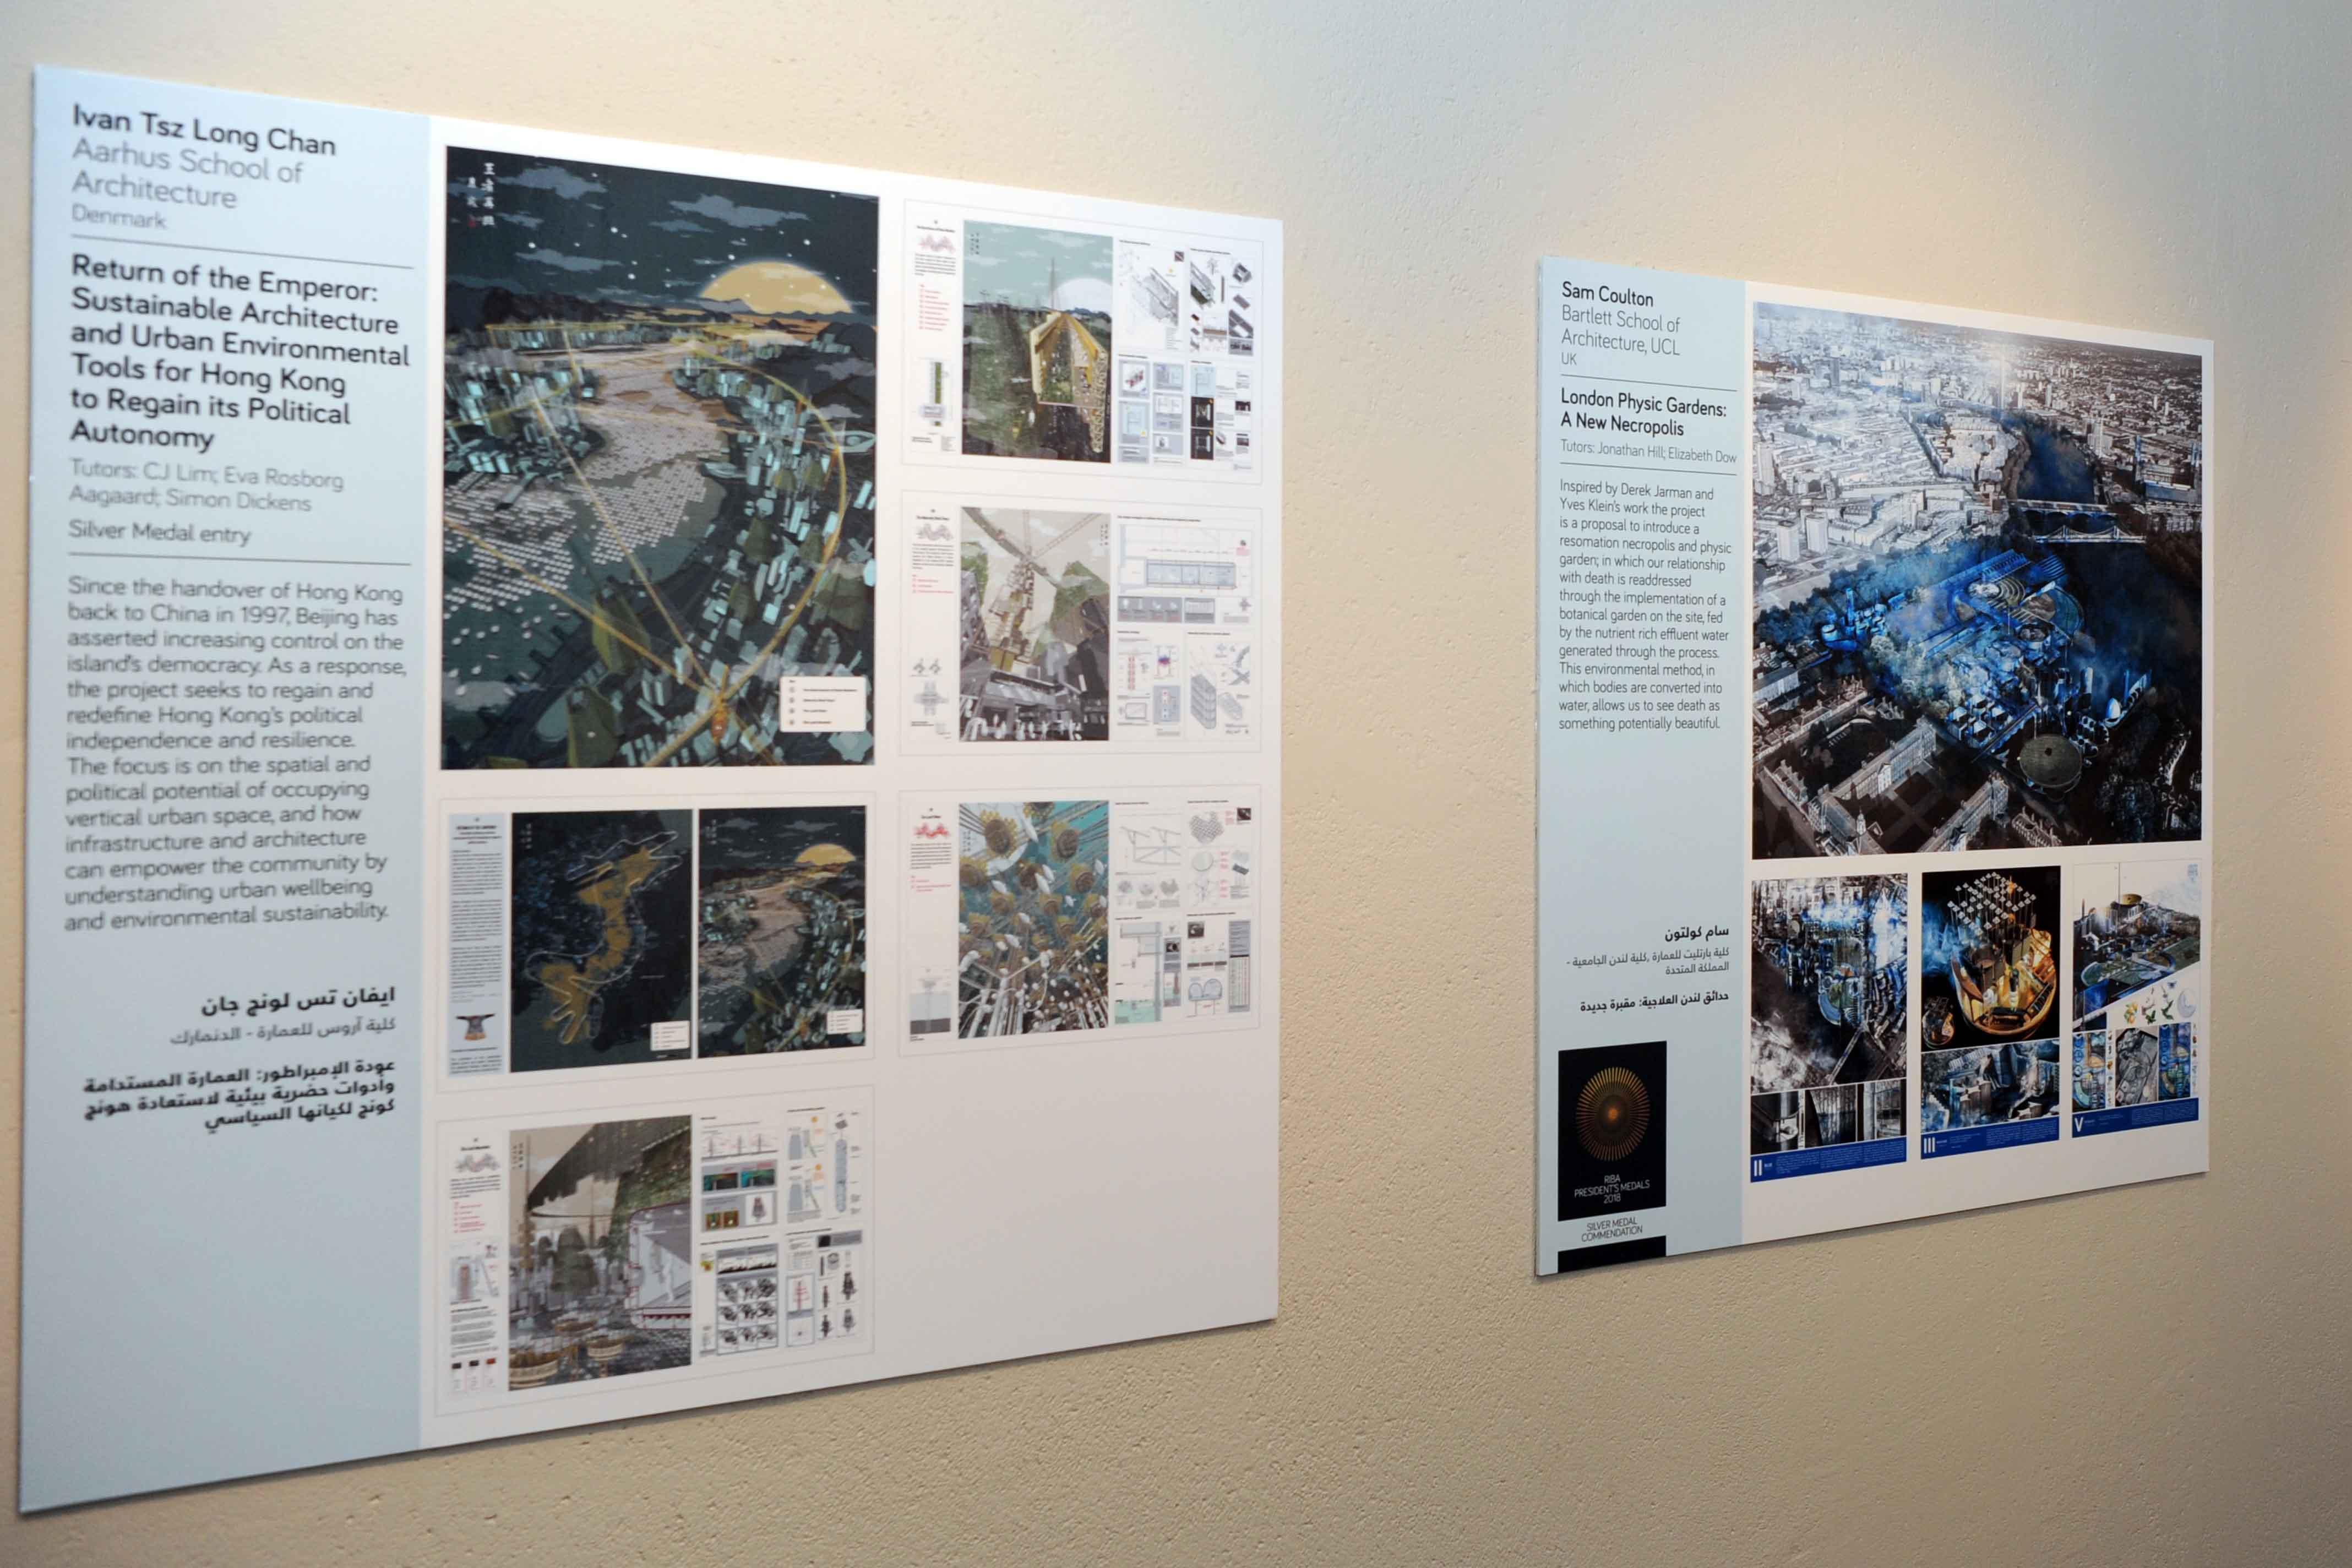 KUNA : Amricani ctr hosts RIBA President's Medal Exhibition